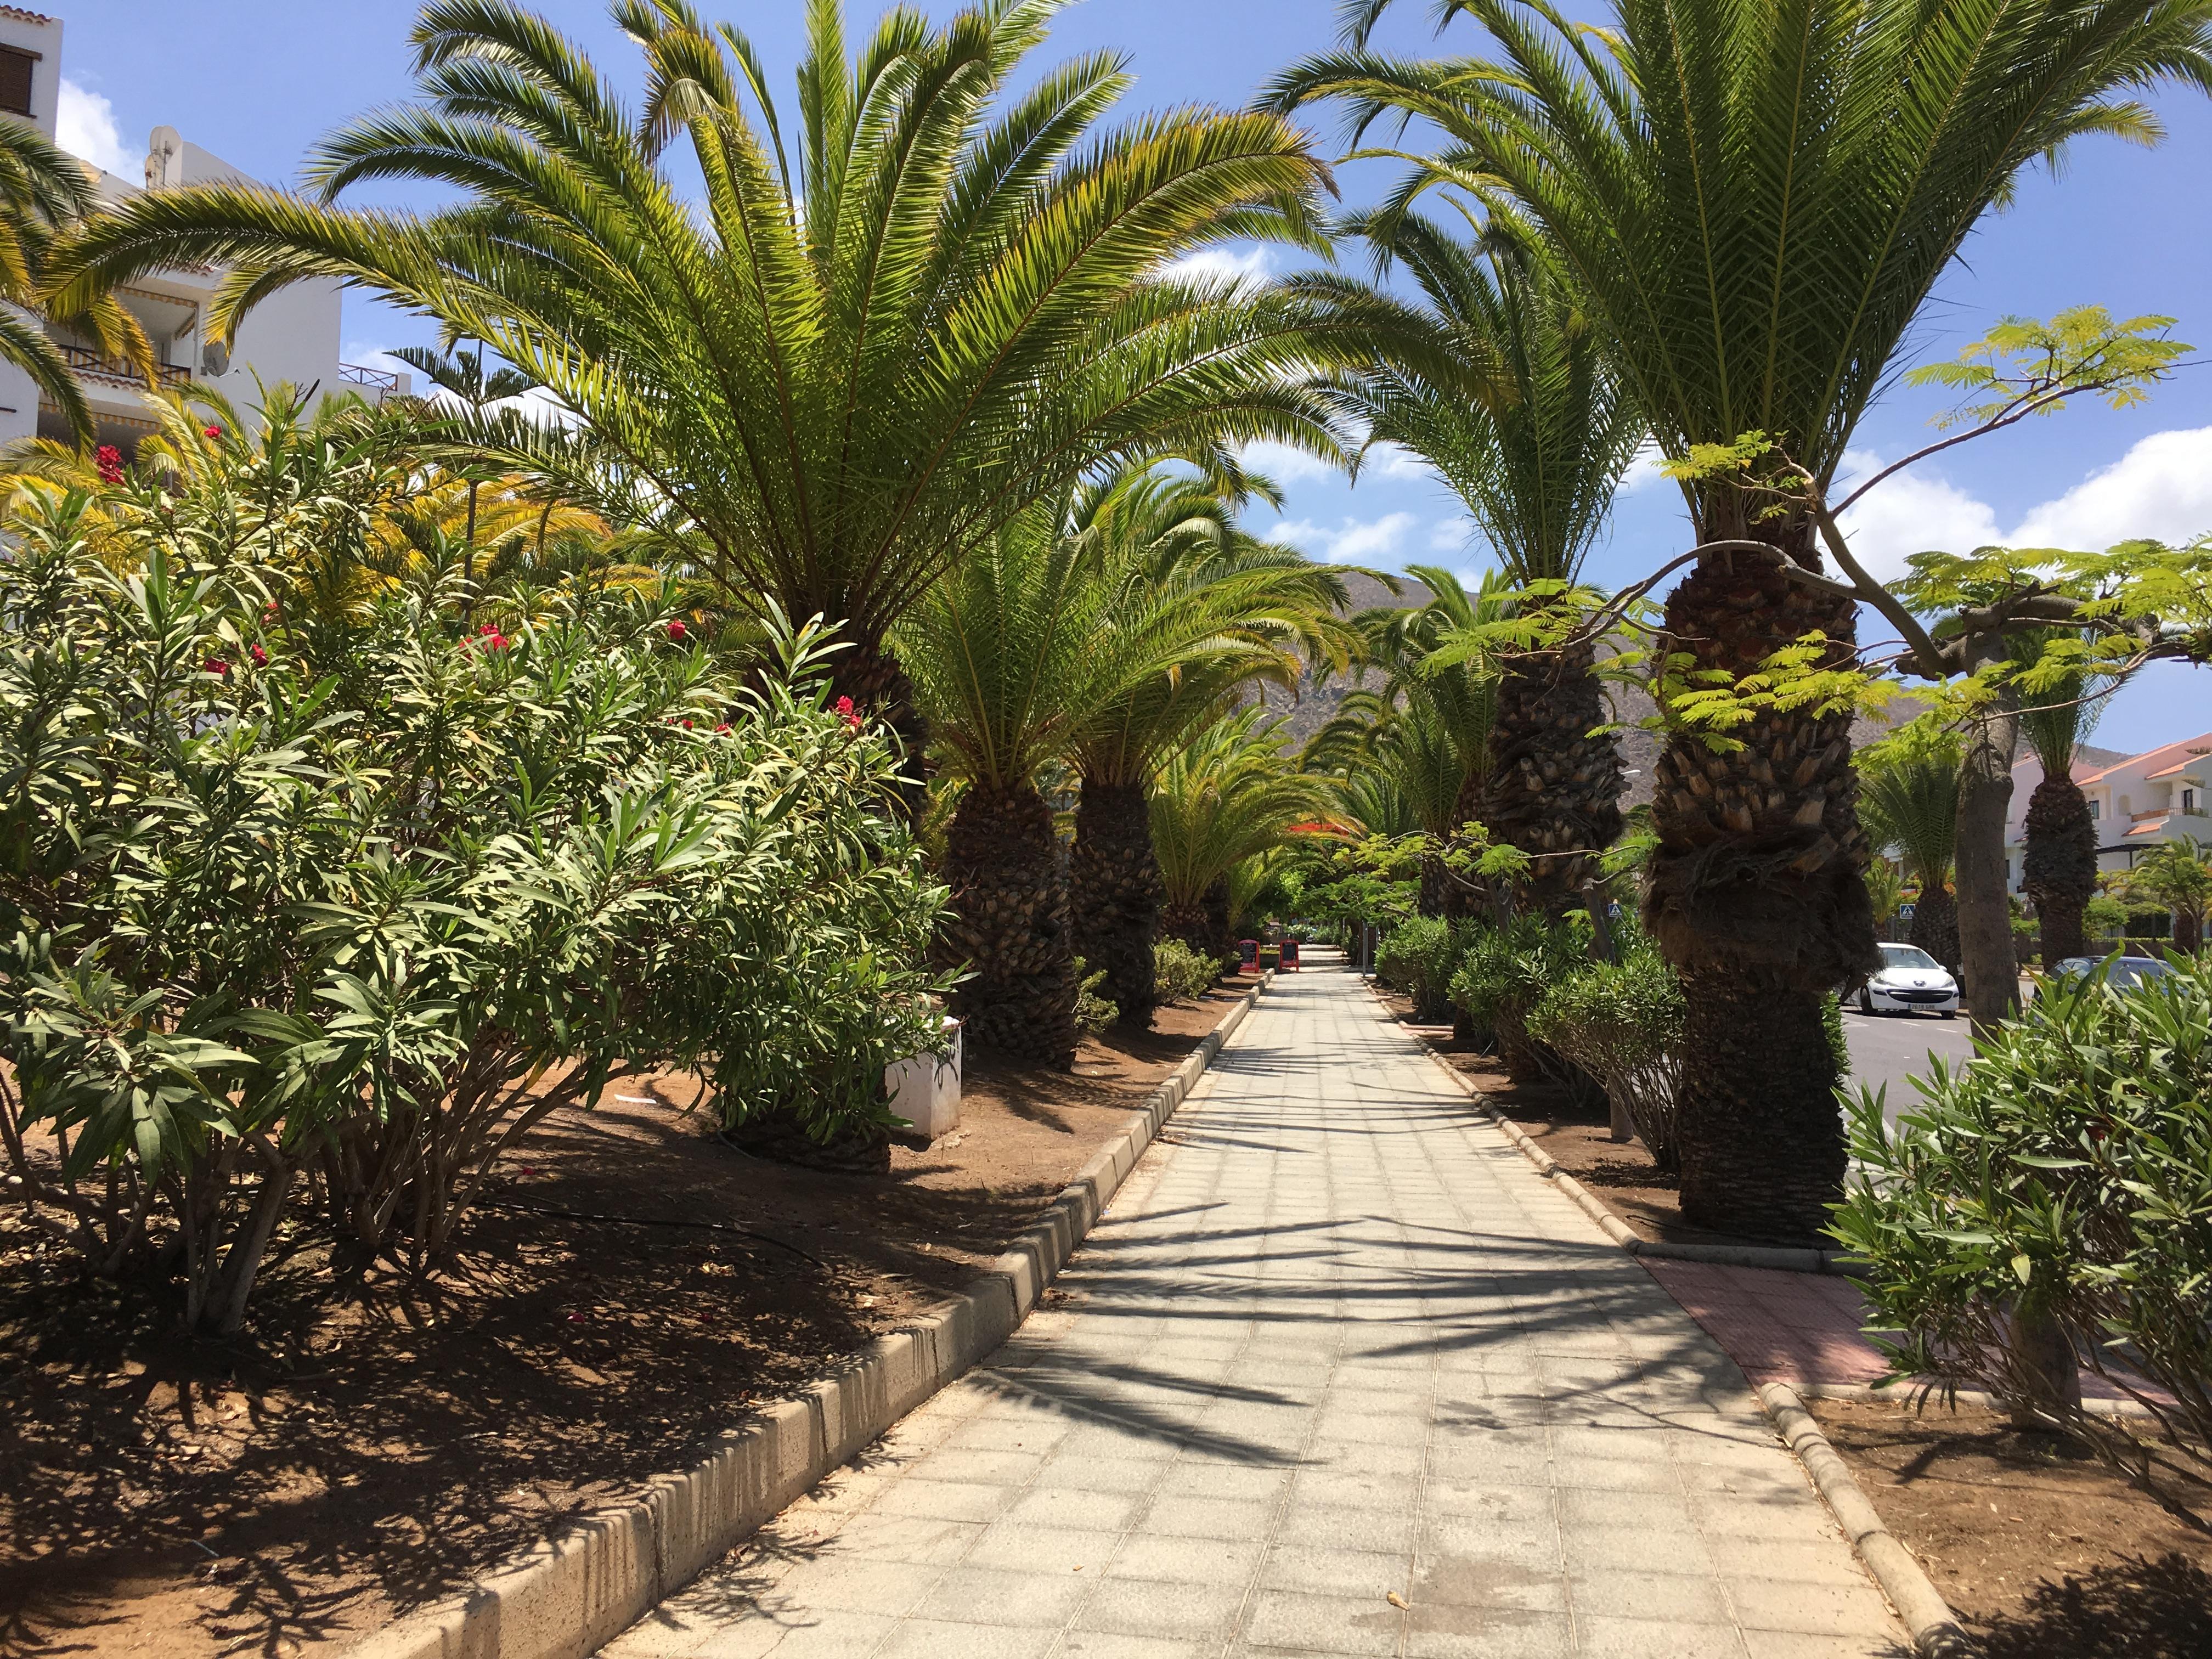 Calatorie in Tenerife